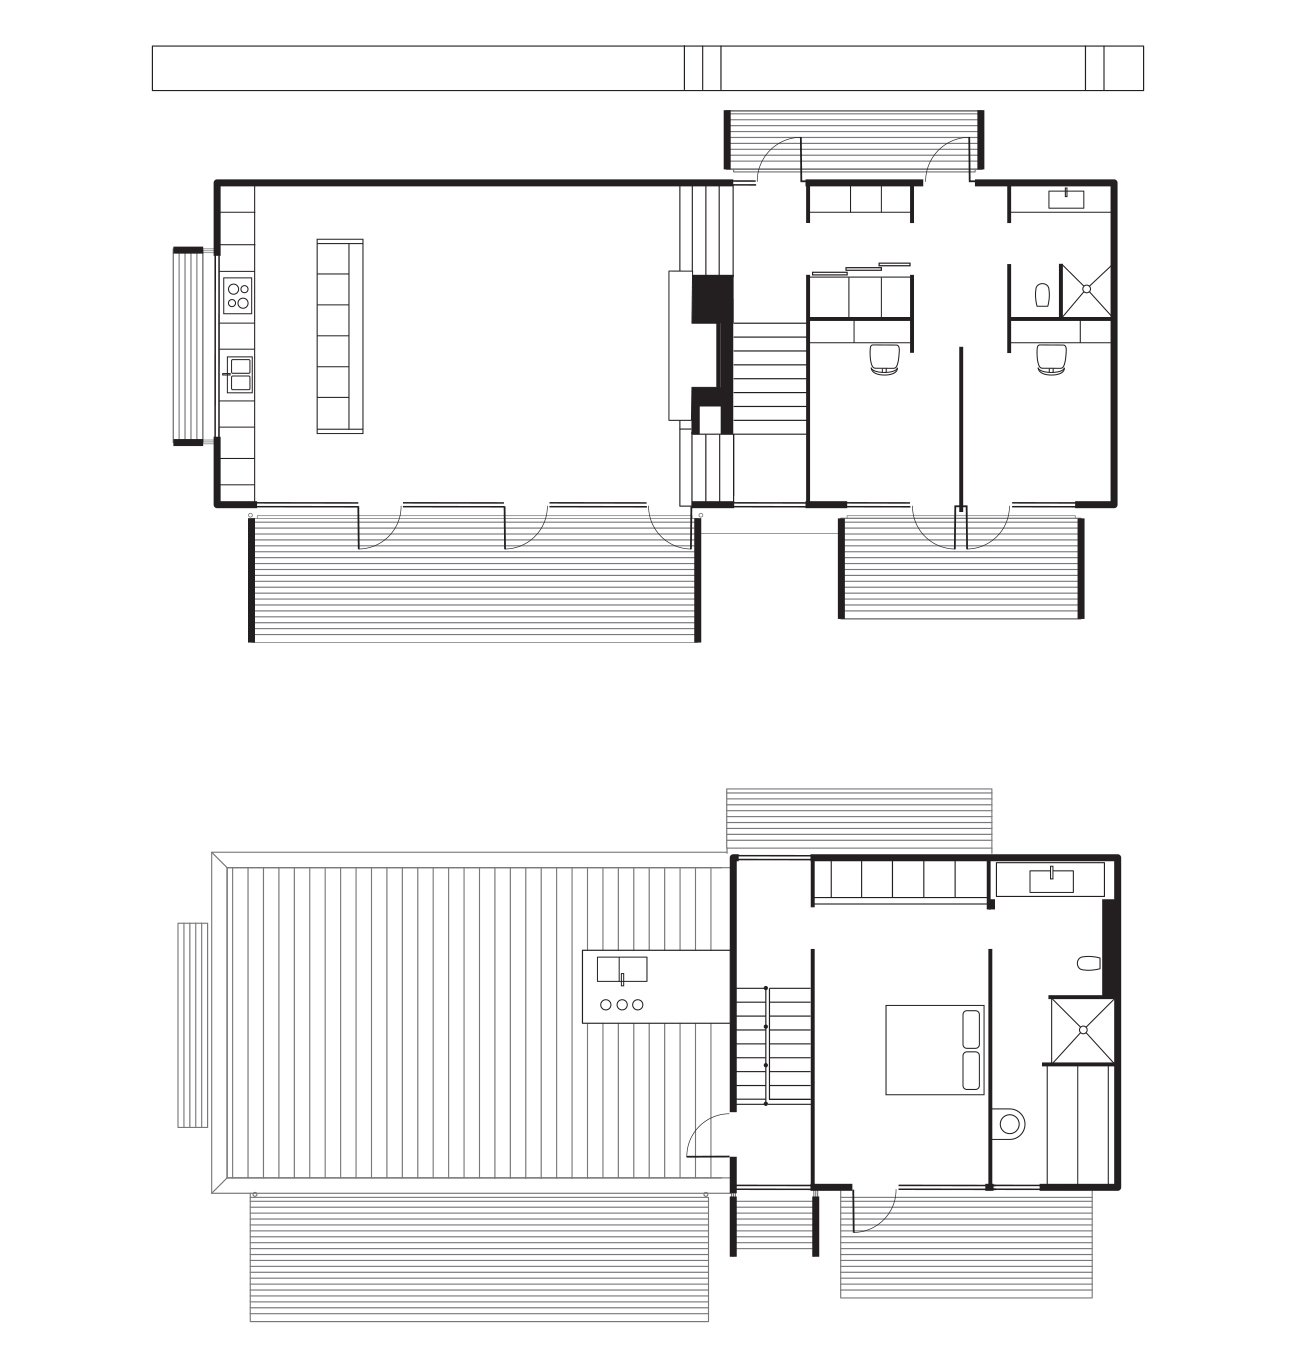 Fjällbacka House Floor Plan  A Kitchen  B Living-Dining Room  C Bedroom  D Bathroom  E Roof Deck  F Master Bedroom  G Master Bathroom  Photo 8 of 8 in A Pine Box Vacation Home in Sweden